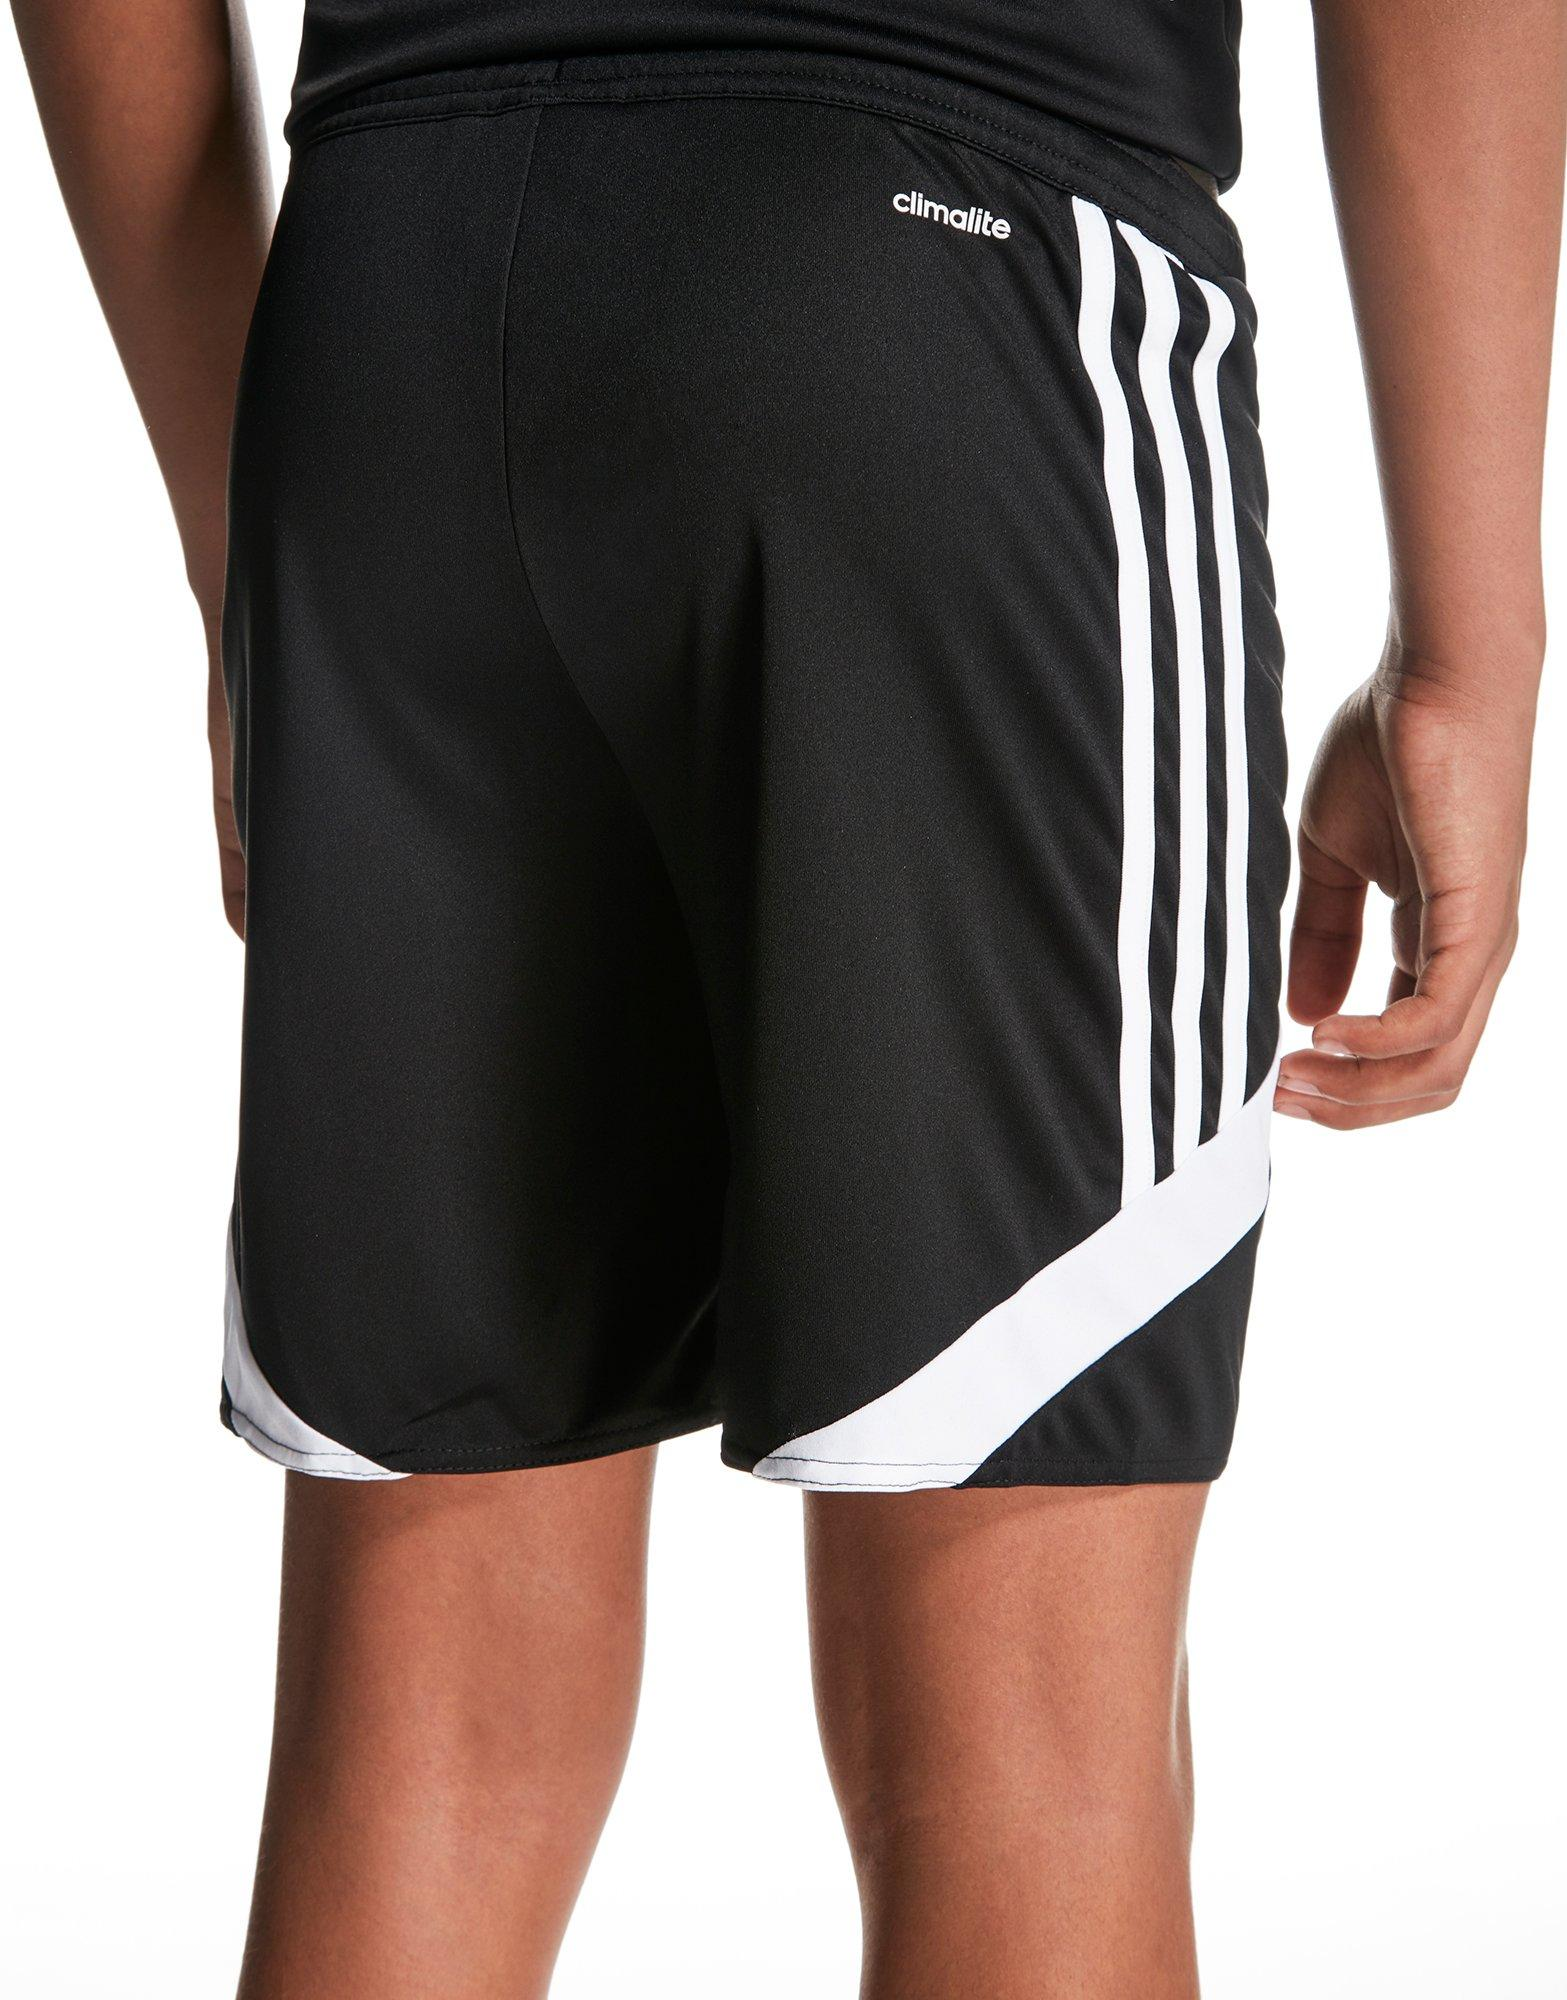 Jd Le Sport Short Adidas Hommes Noir